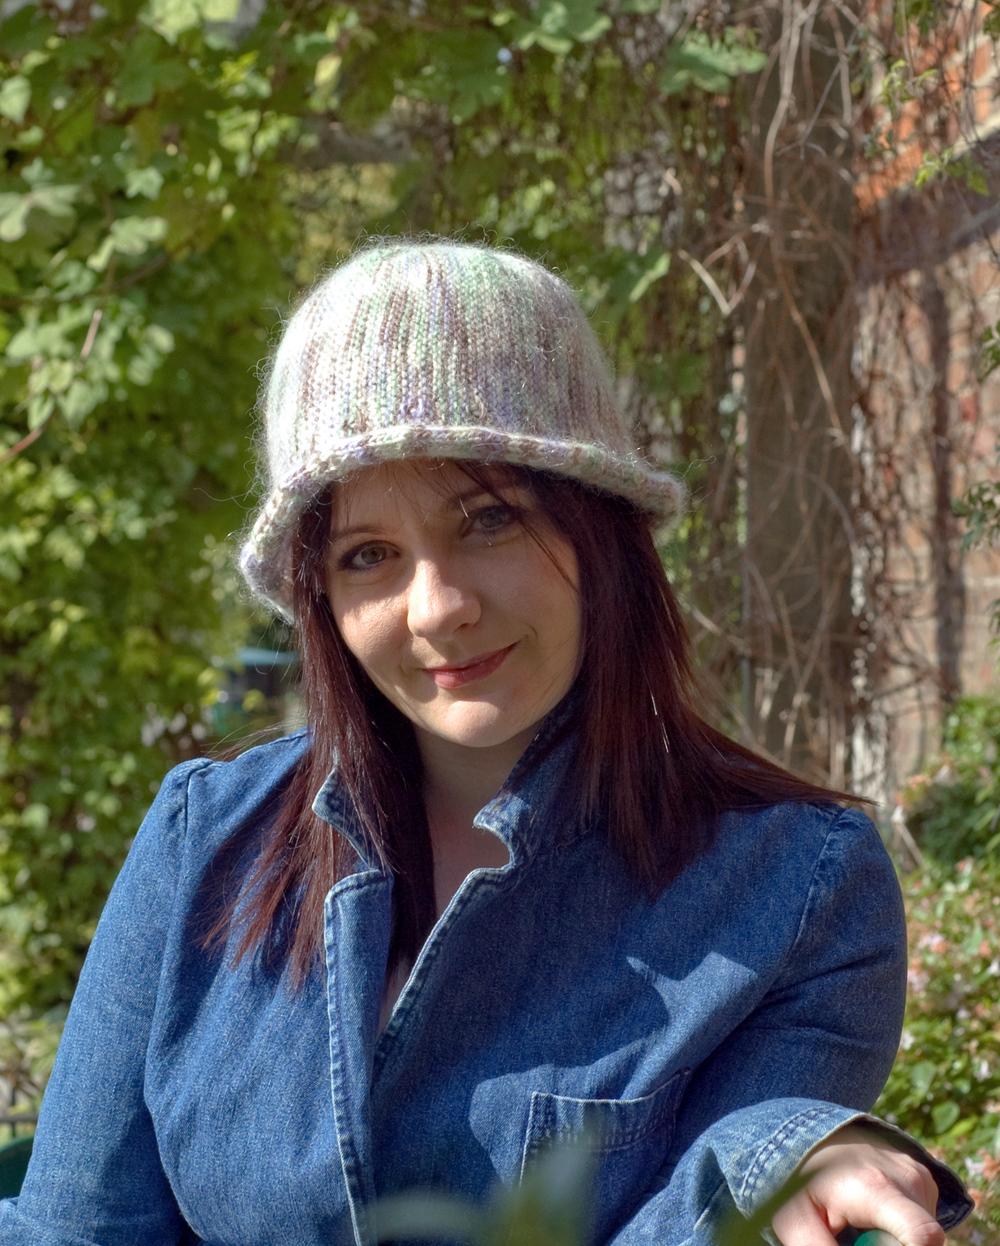 Bella sideways knit brimmed cloche Hat pattern for variegated yarn